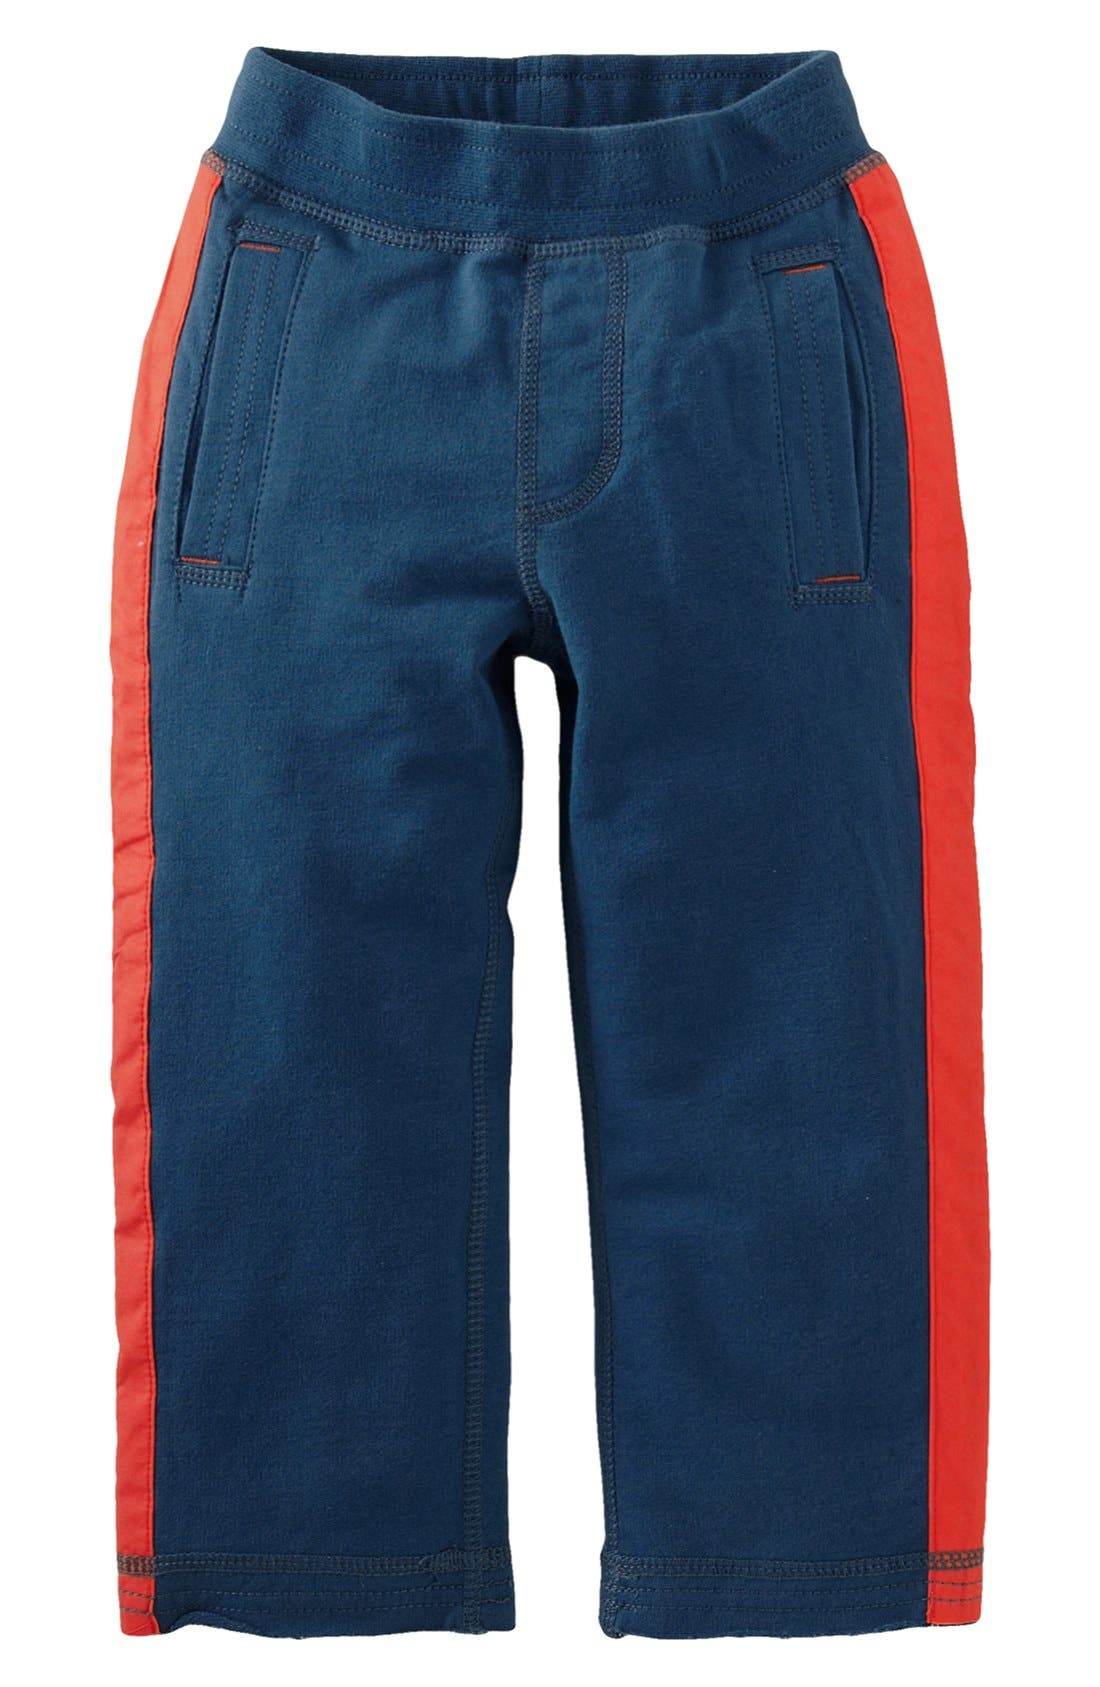 Main Image - Tea Collection Side Stripe Pants (Toddler Boys)